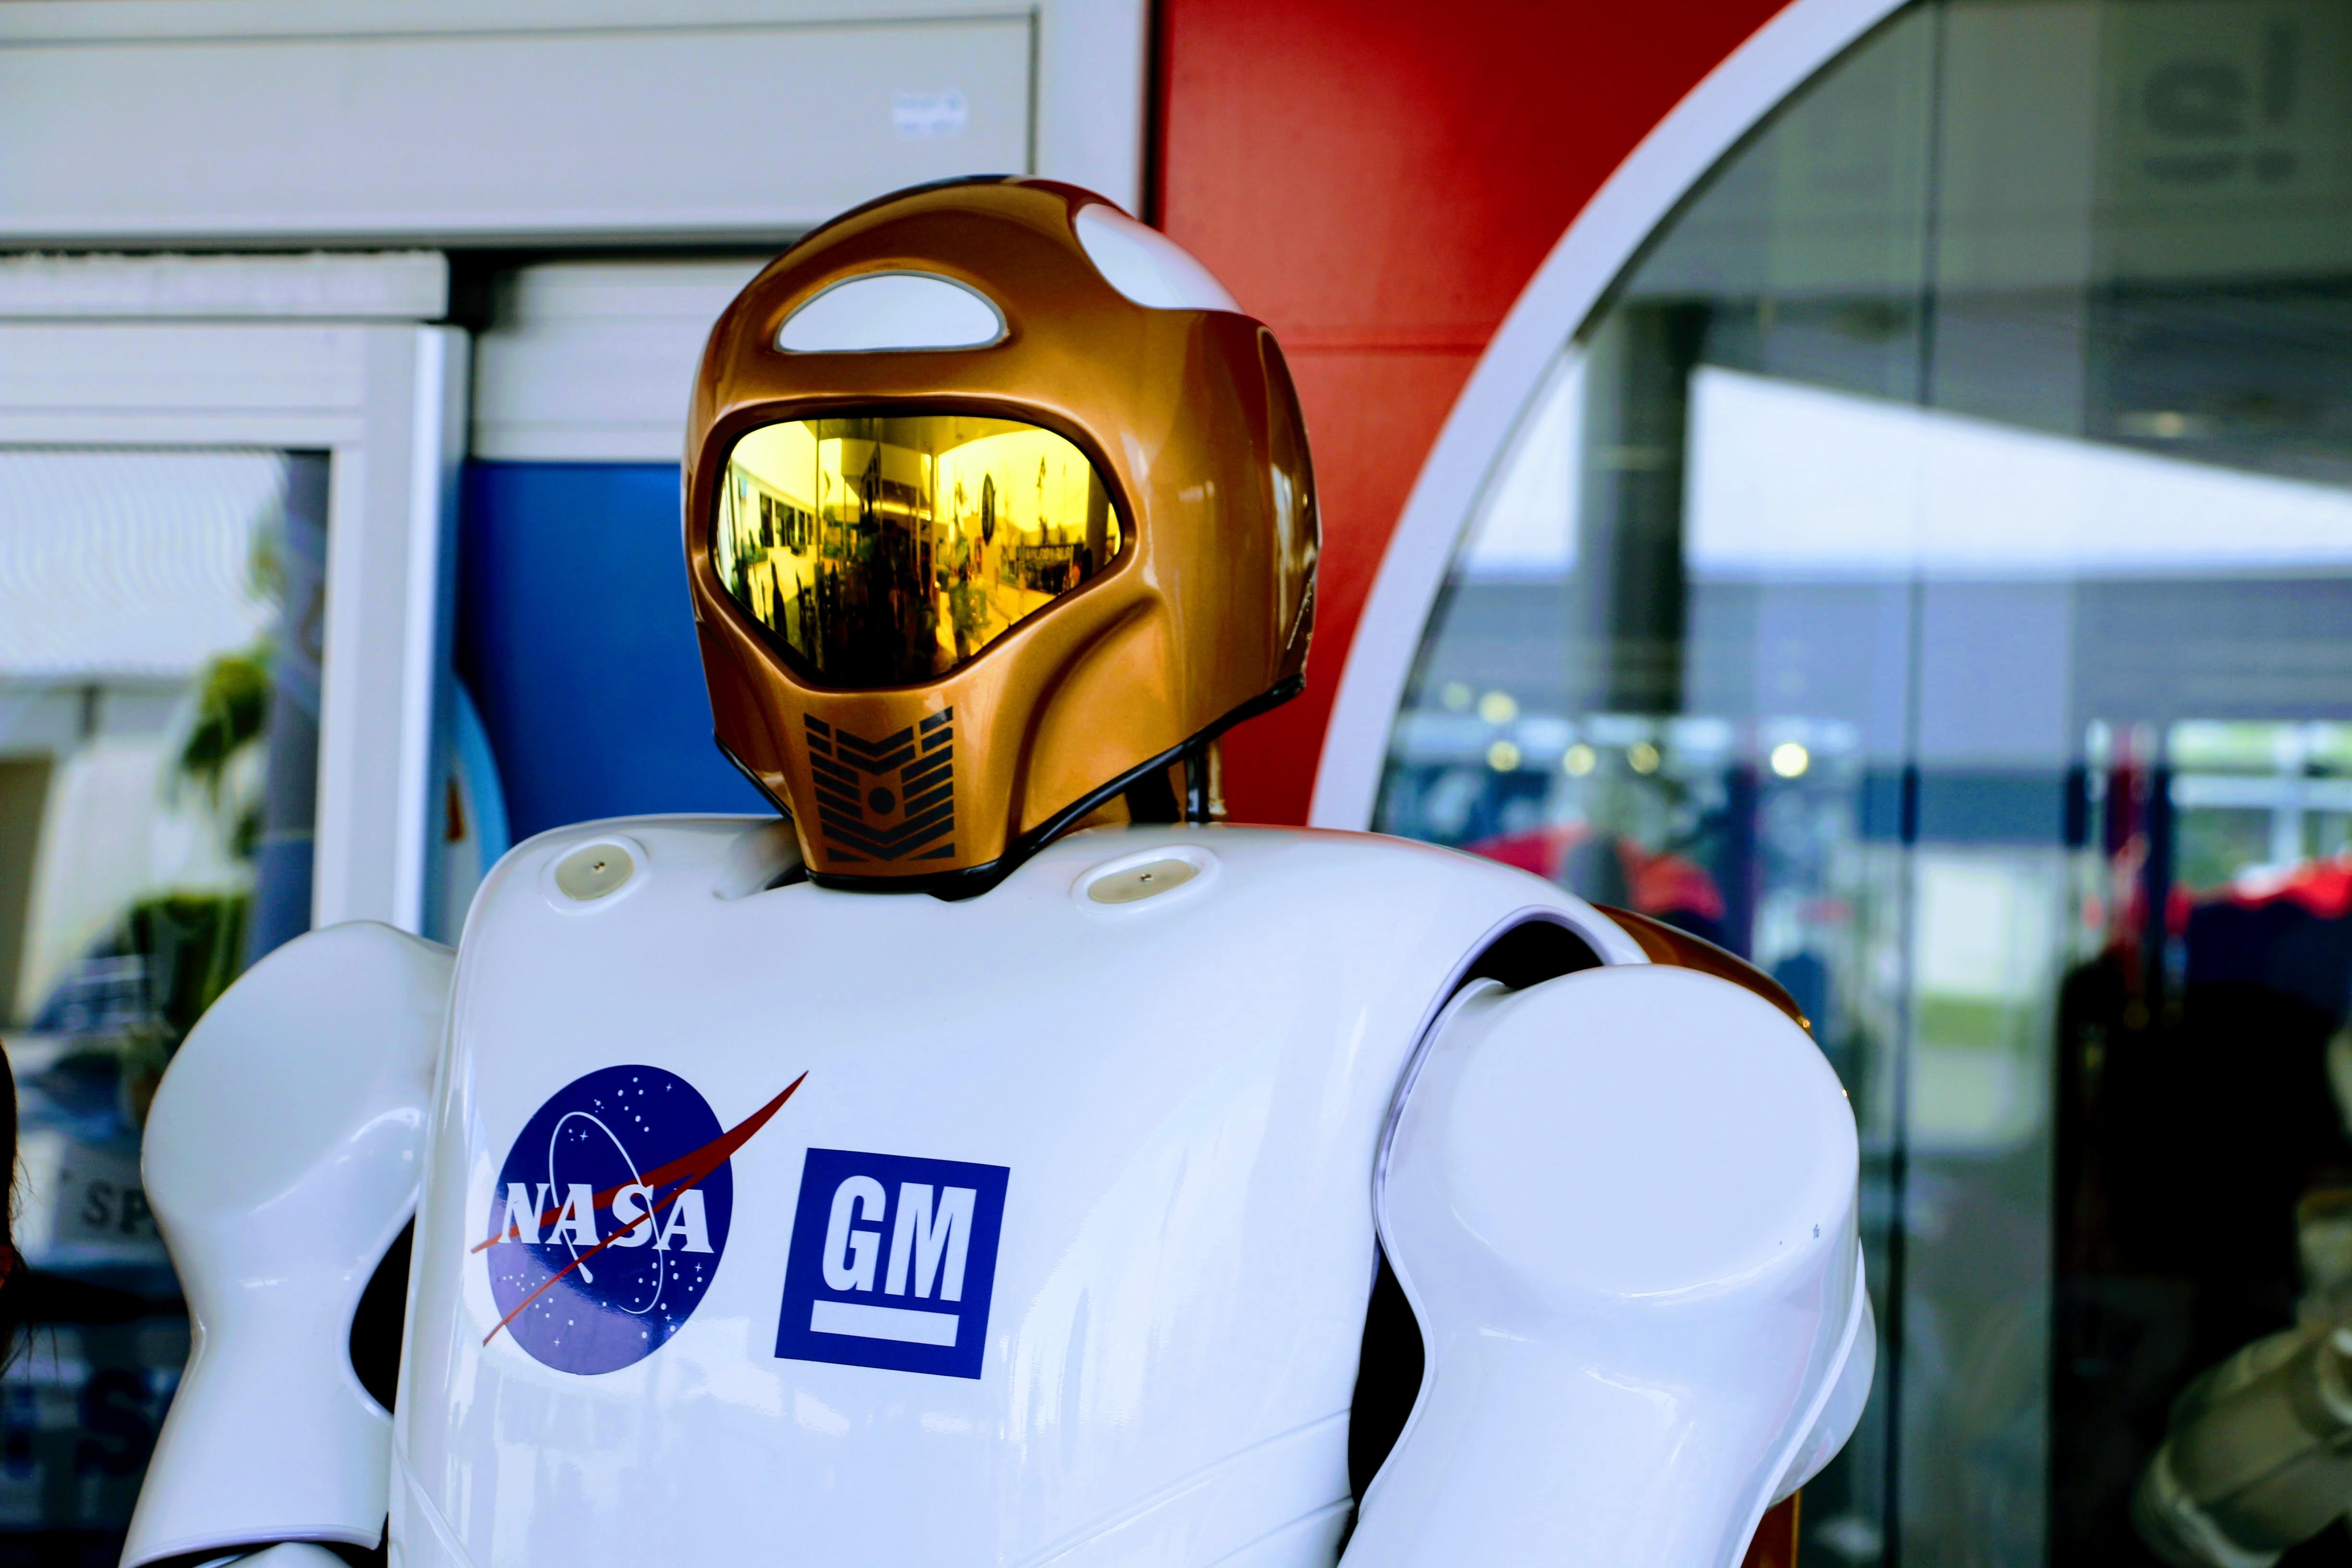 Robot NASA GM